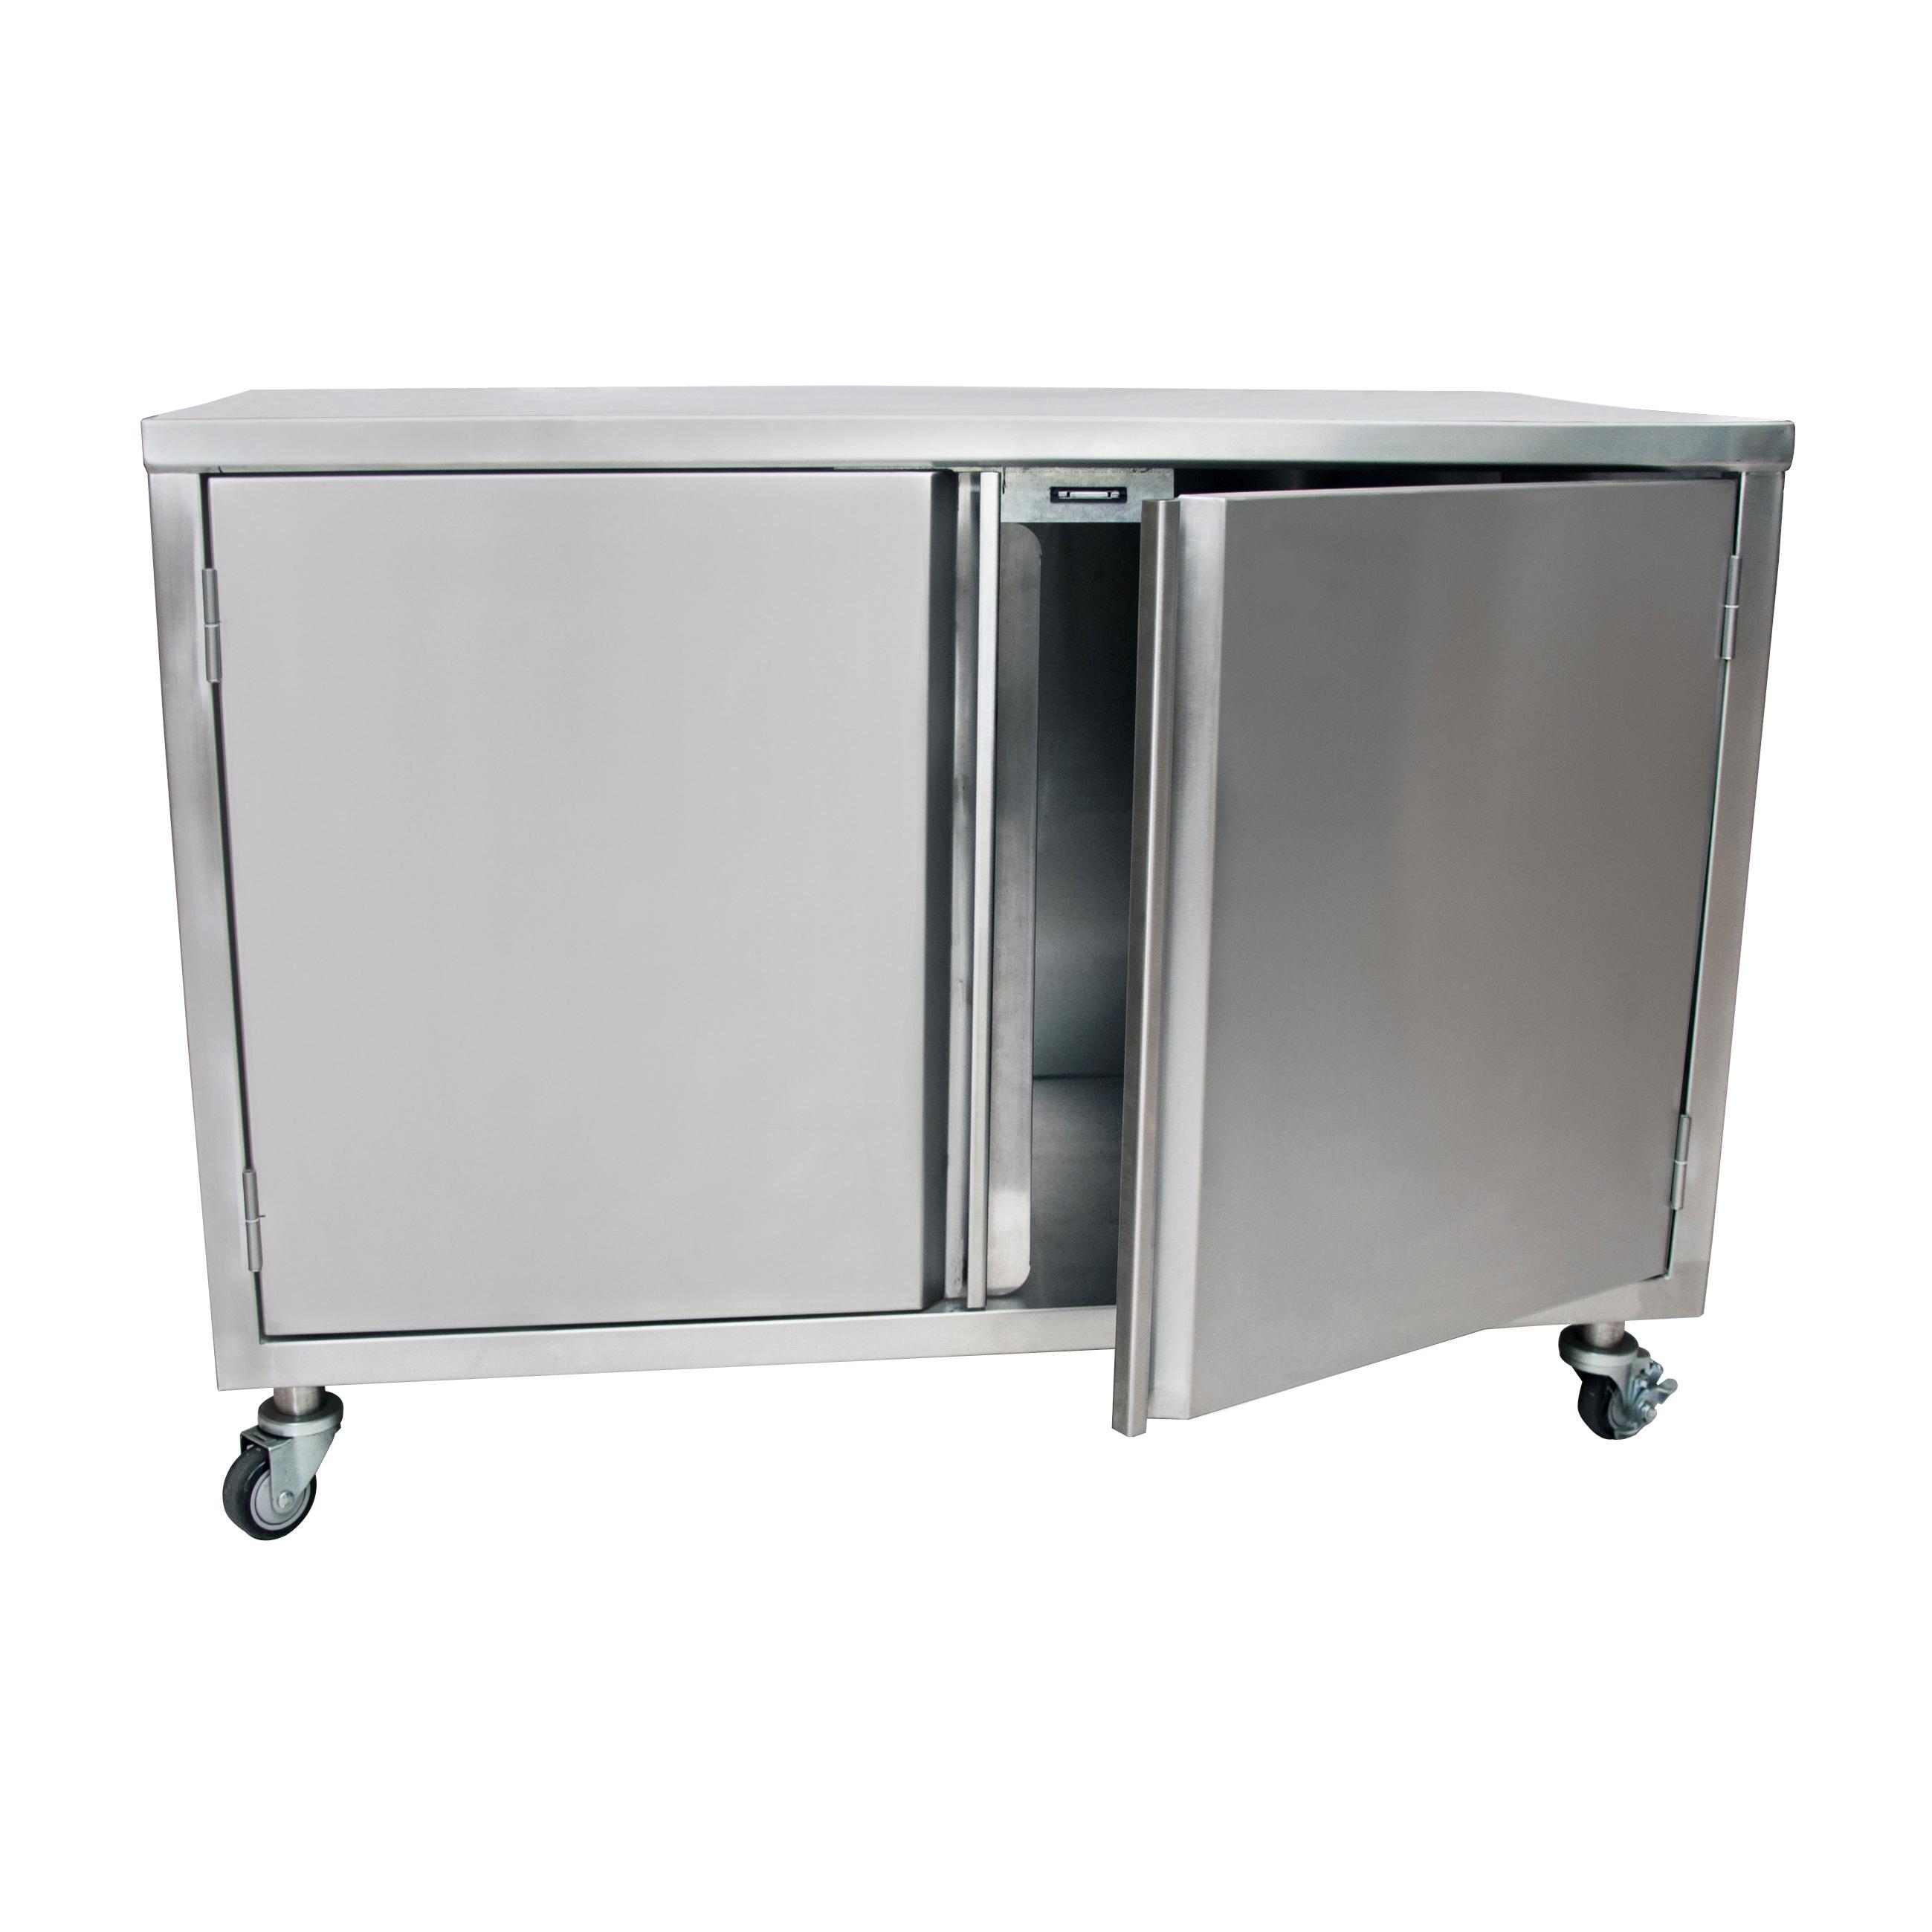 BK Resources BKDC-3048H work table, cabinet base hinged doors